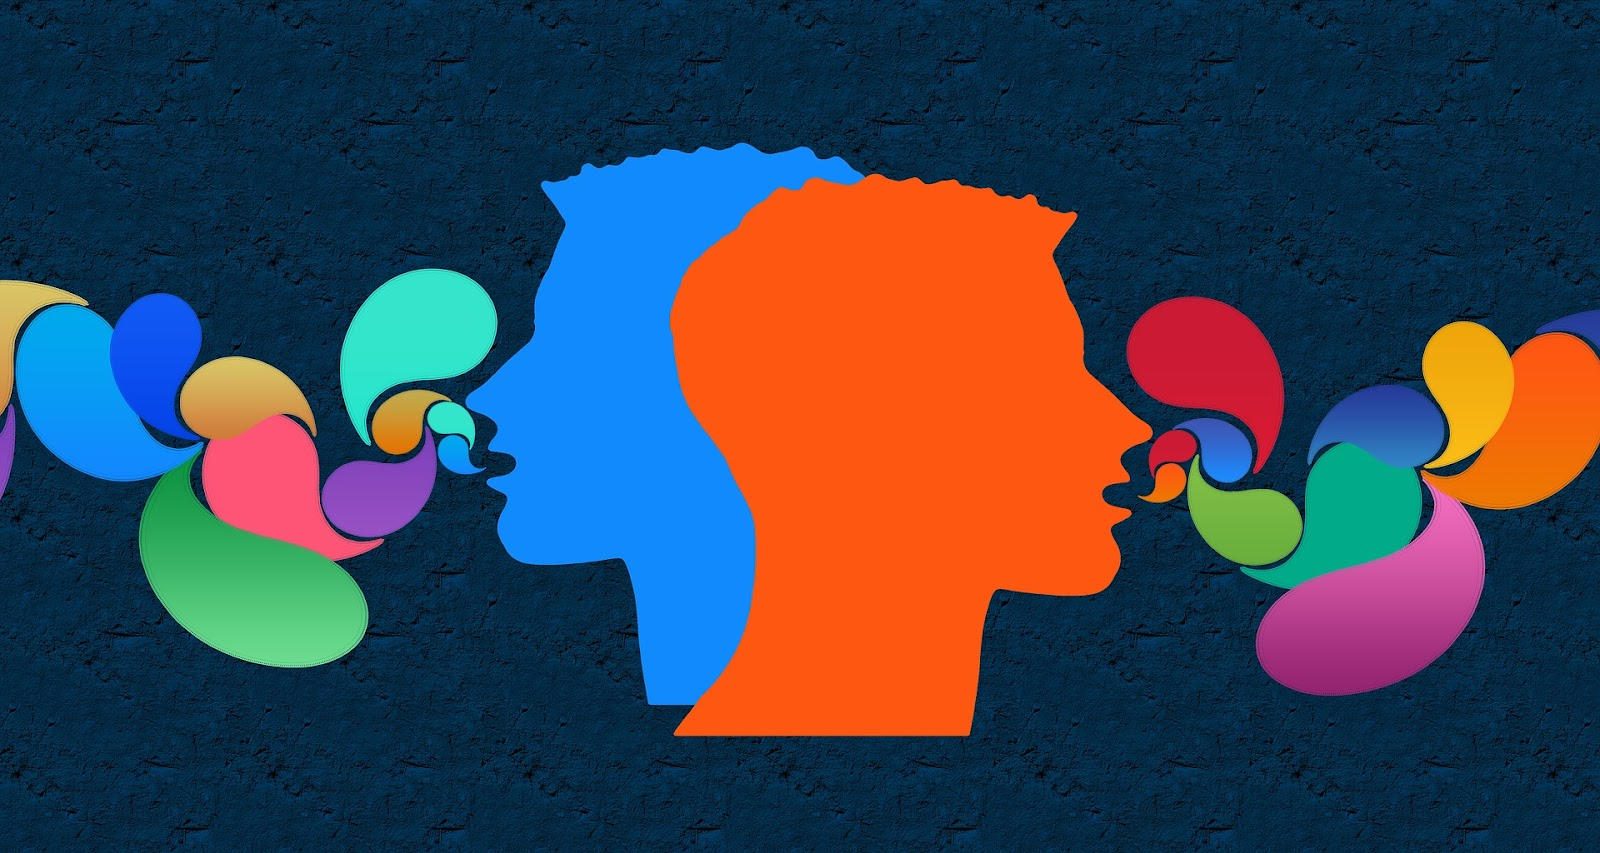 Color Psychology And Smart Lighting